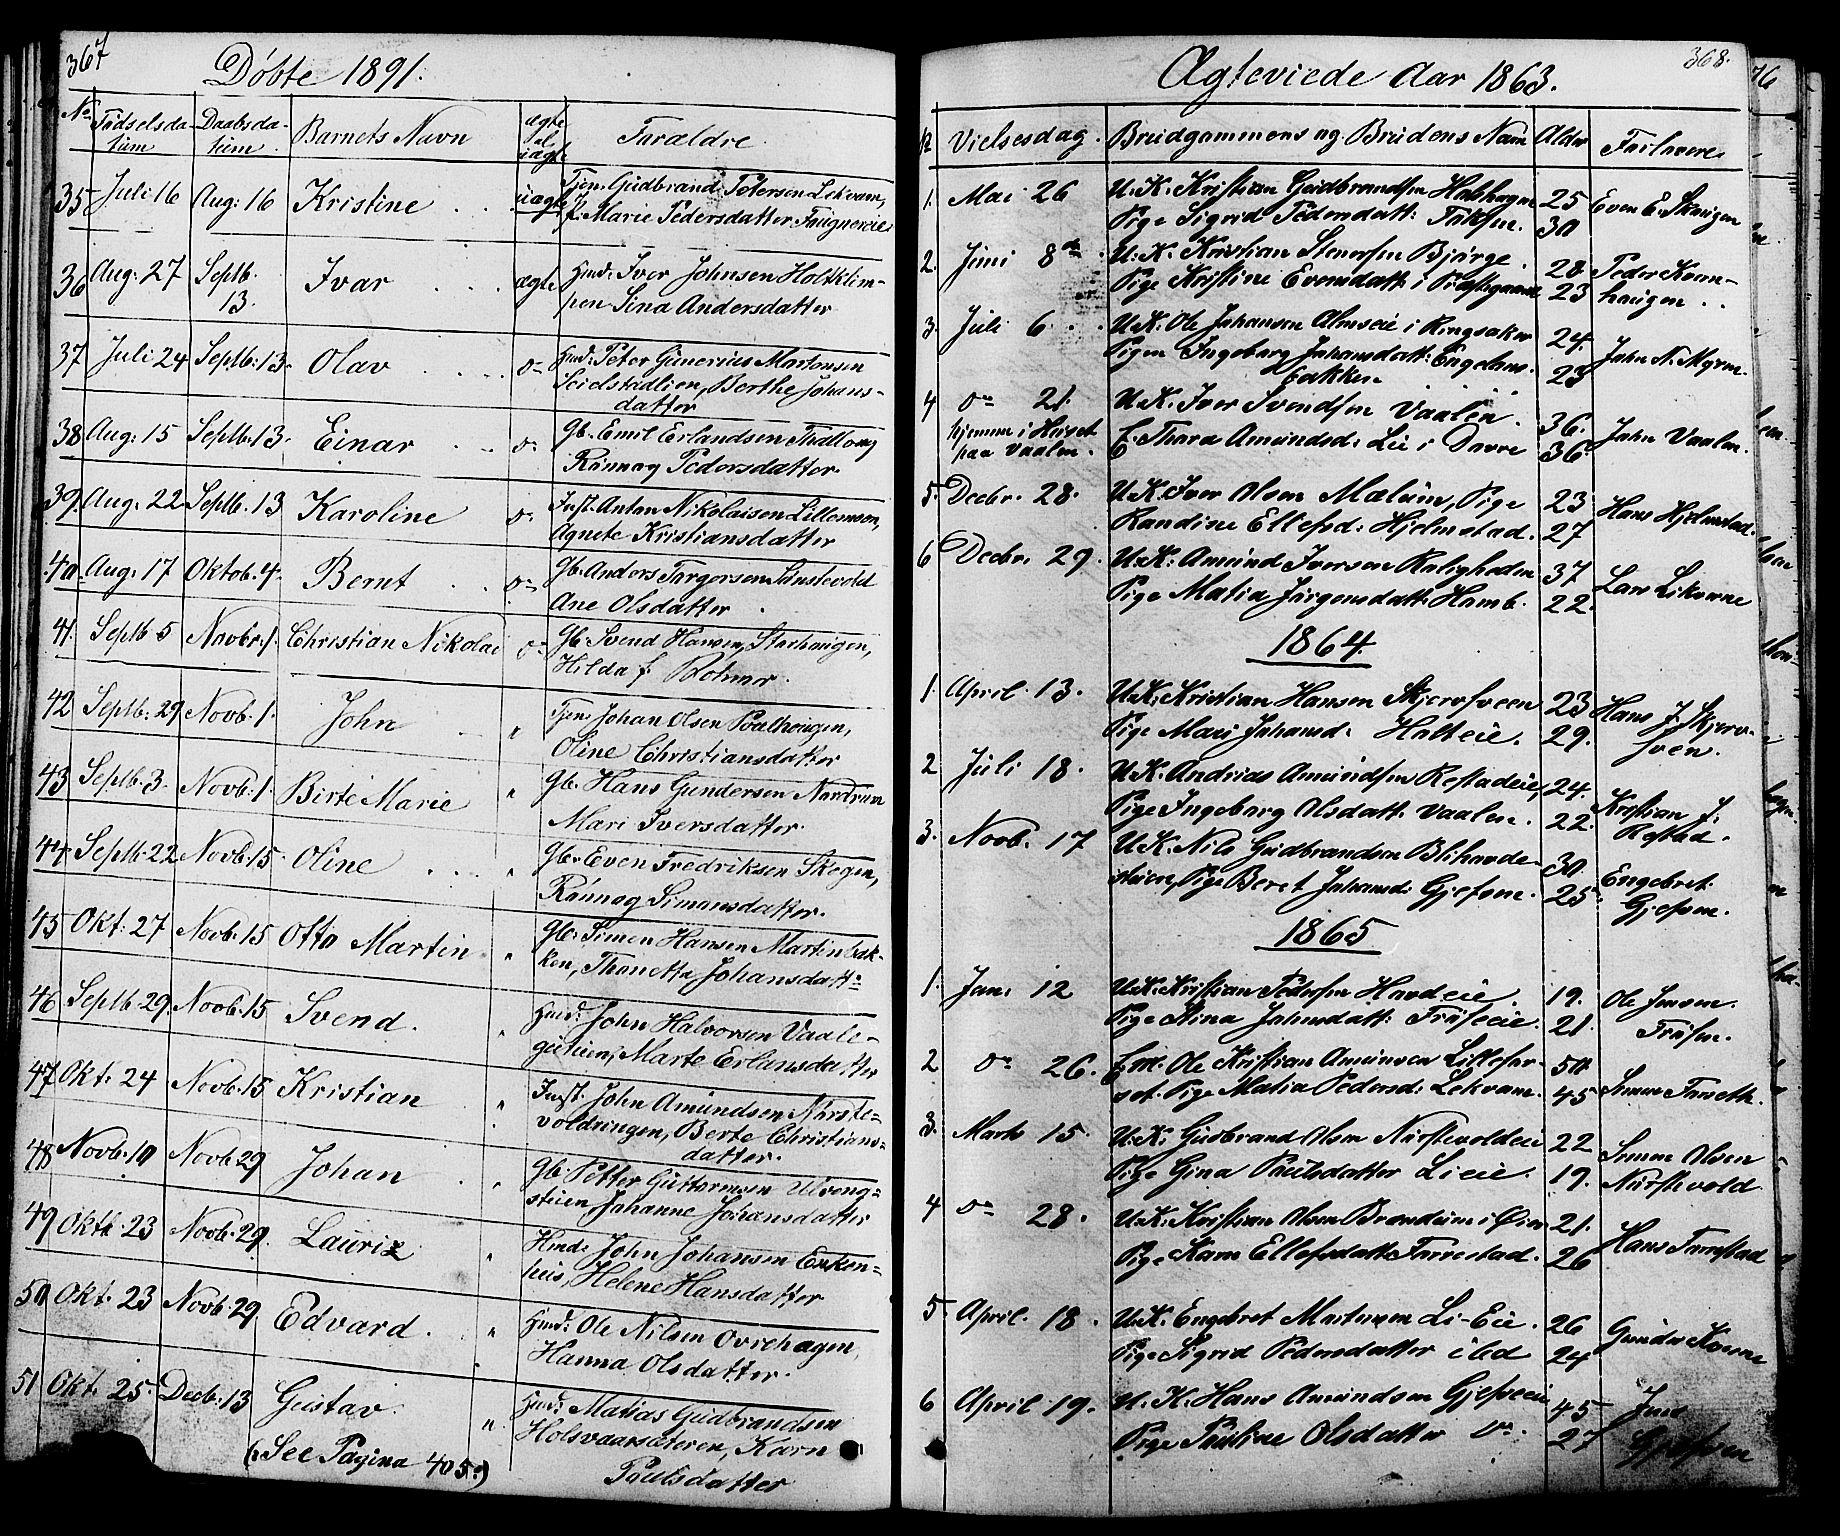 SAH, Østre Gausdal prestekontor, Klokkerbok nr. 1, 1863-1893, s. 367-368